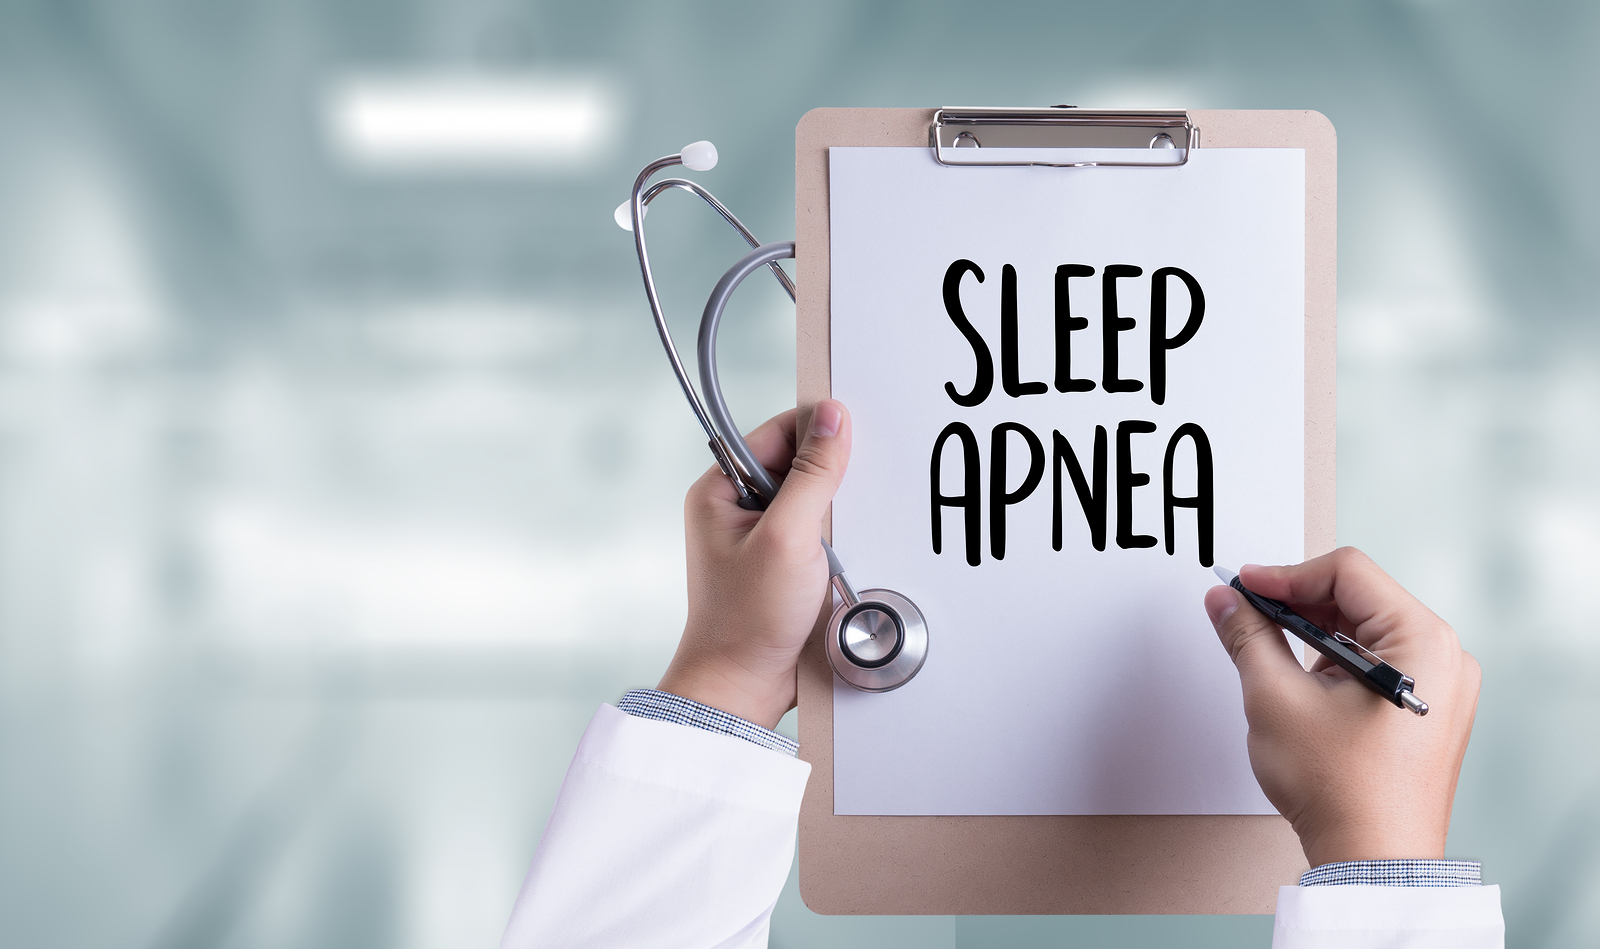 sleep apnea using CPAP machine SLEEP APNEA Diagnosis Sleep apnea SLEEP APNEA